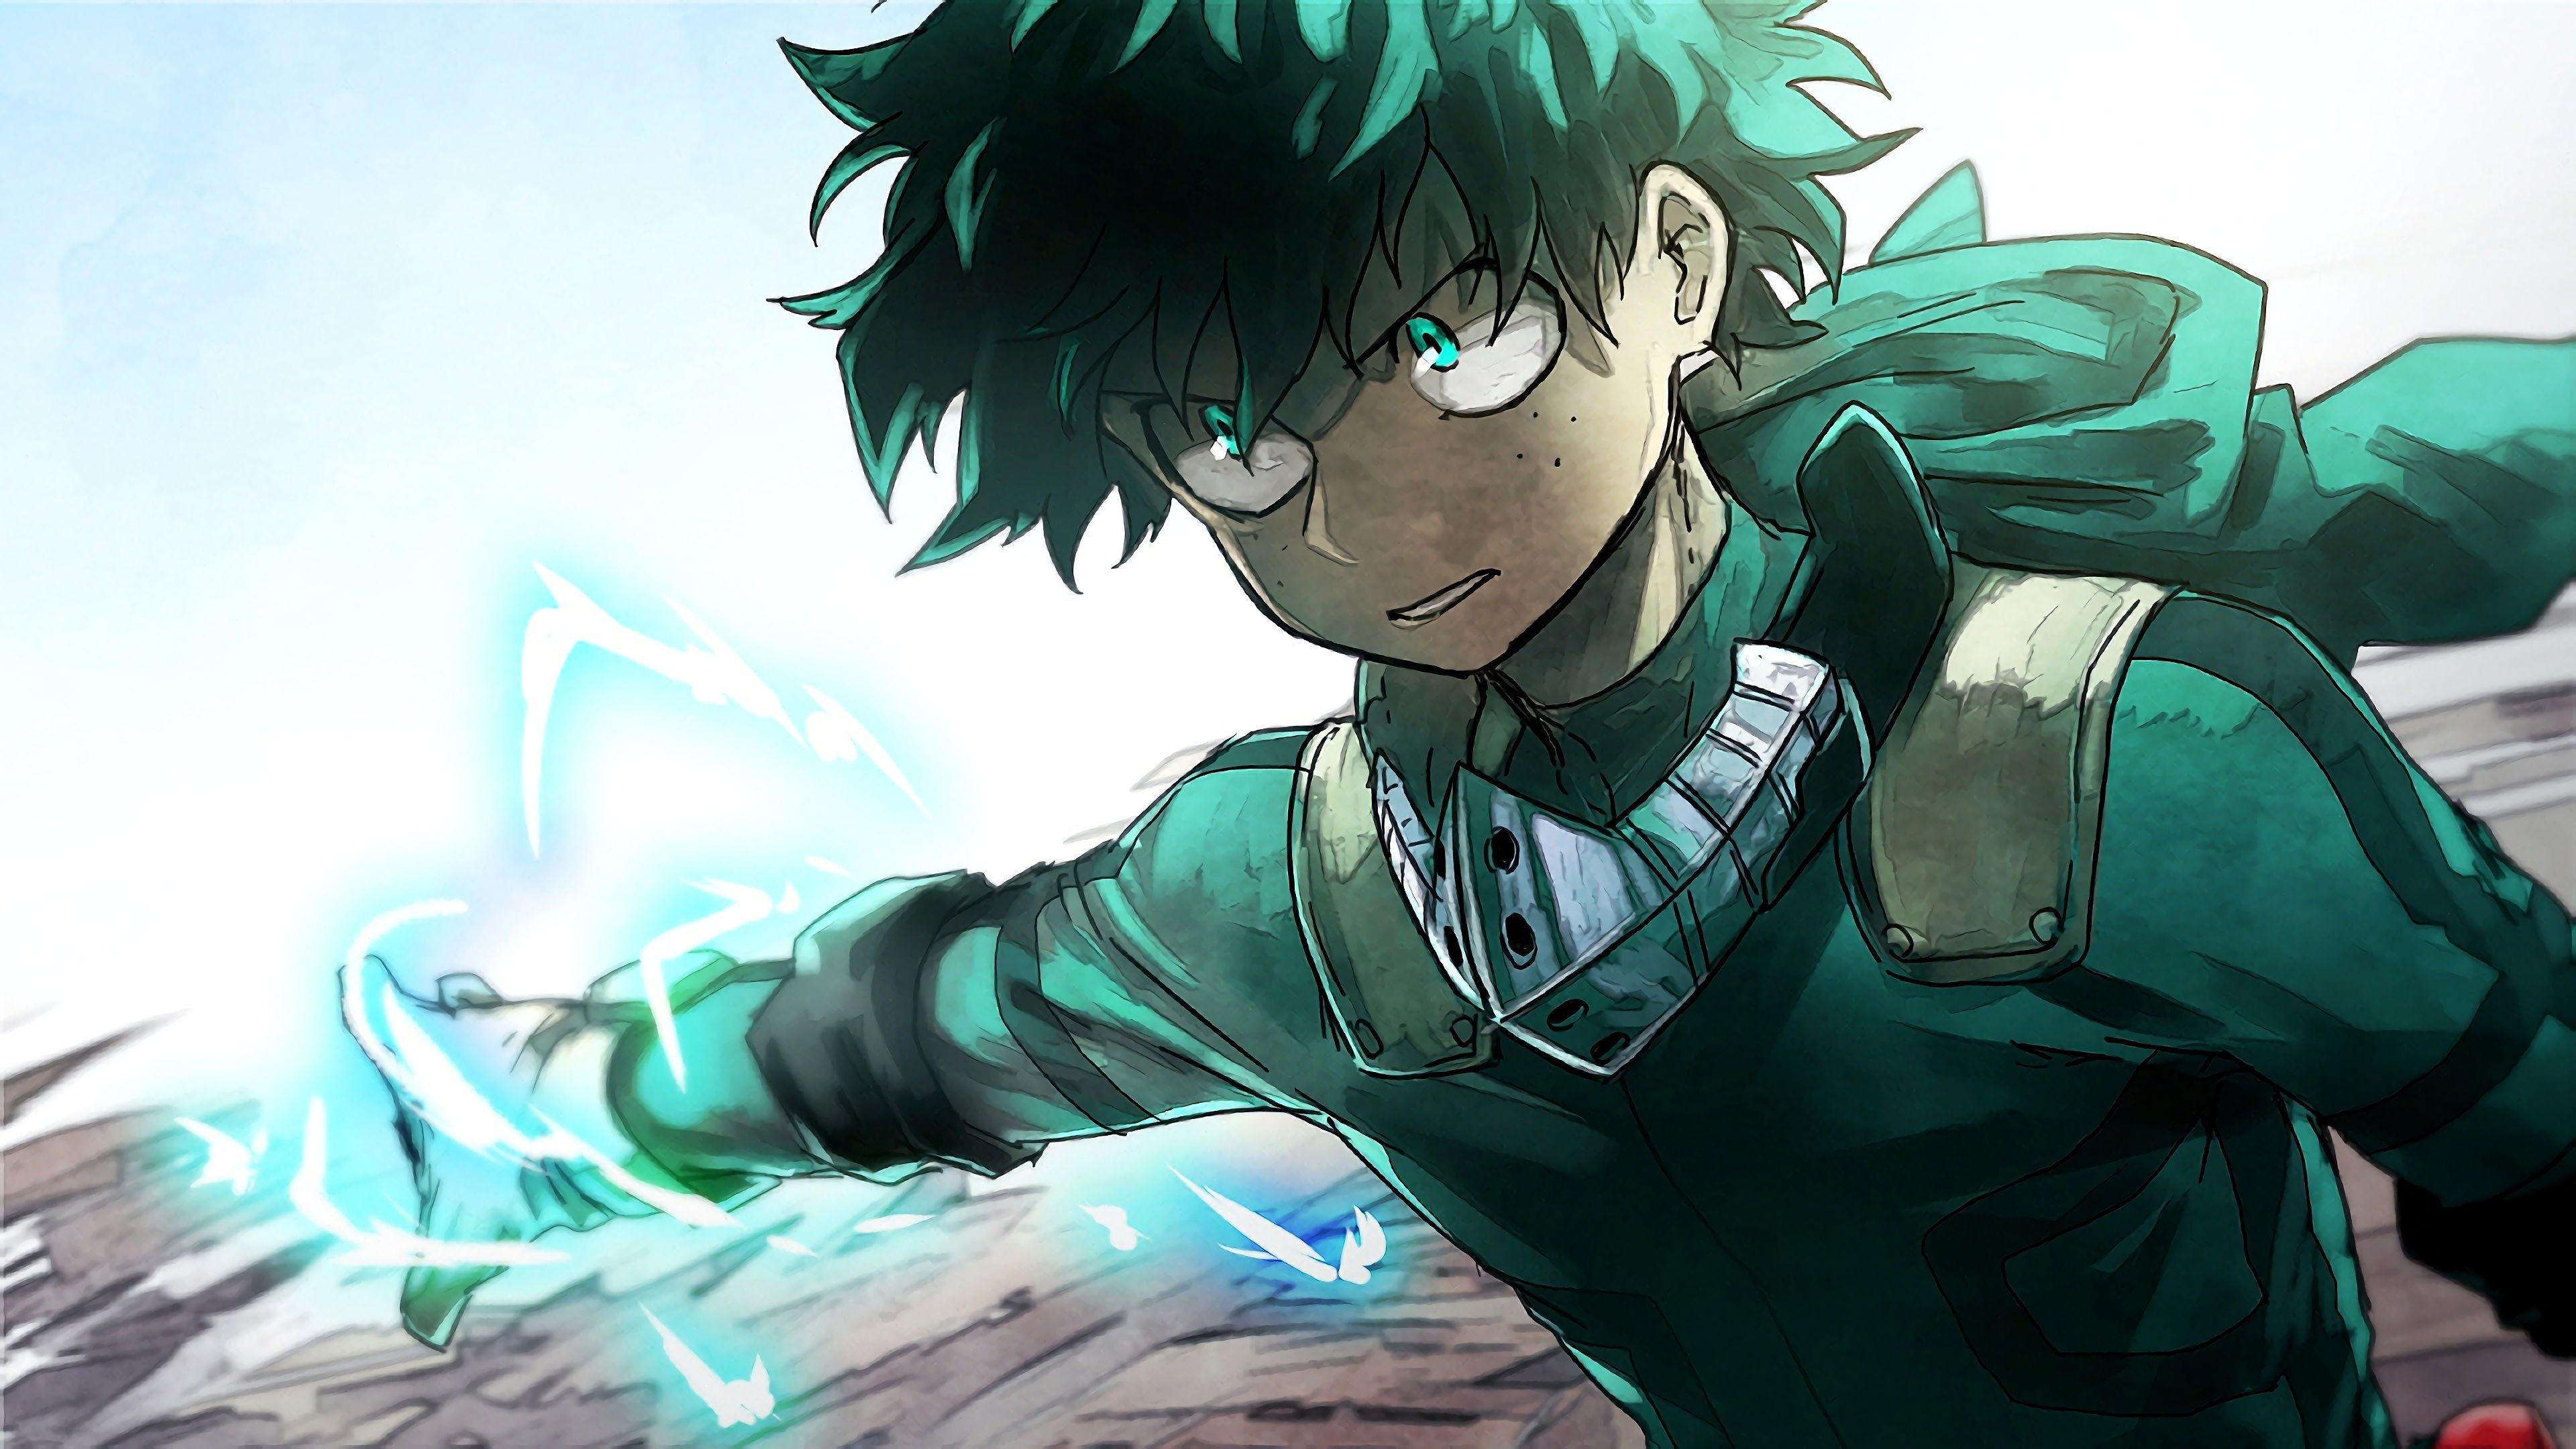 3840x2160 Izuku Midoriya, My Hero Academia, Boku no Hero Academia, Anime, 3840x2160, Hình nền.  Anh hùng của tôi, Boku no hero academia, My hero academia